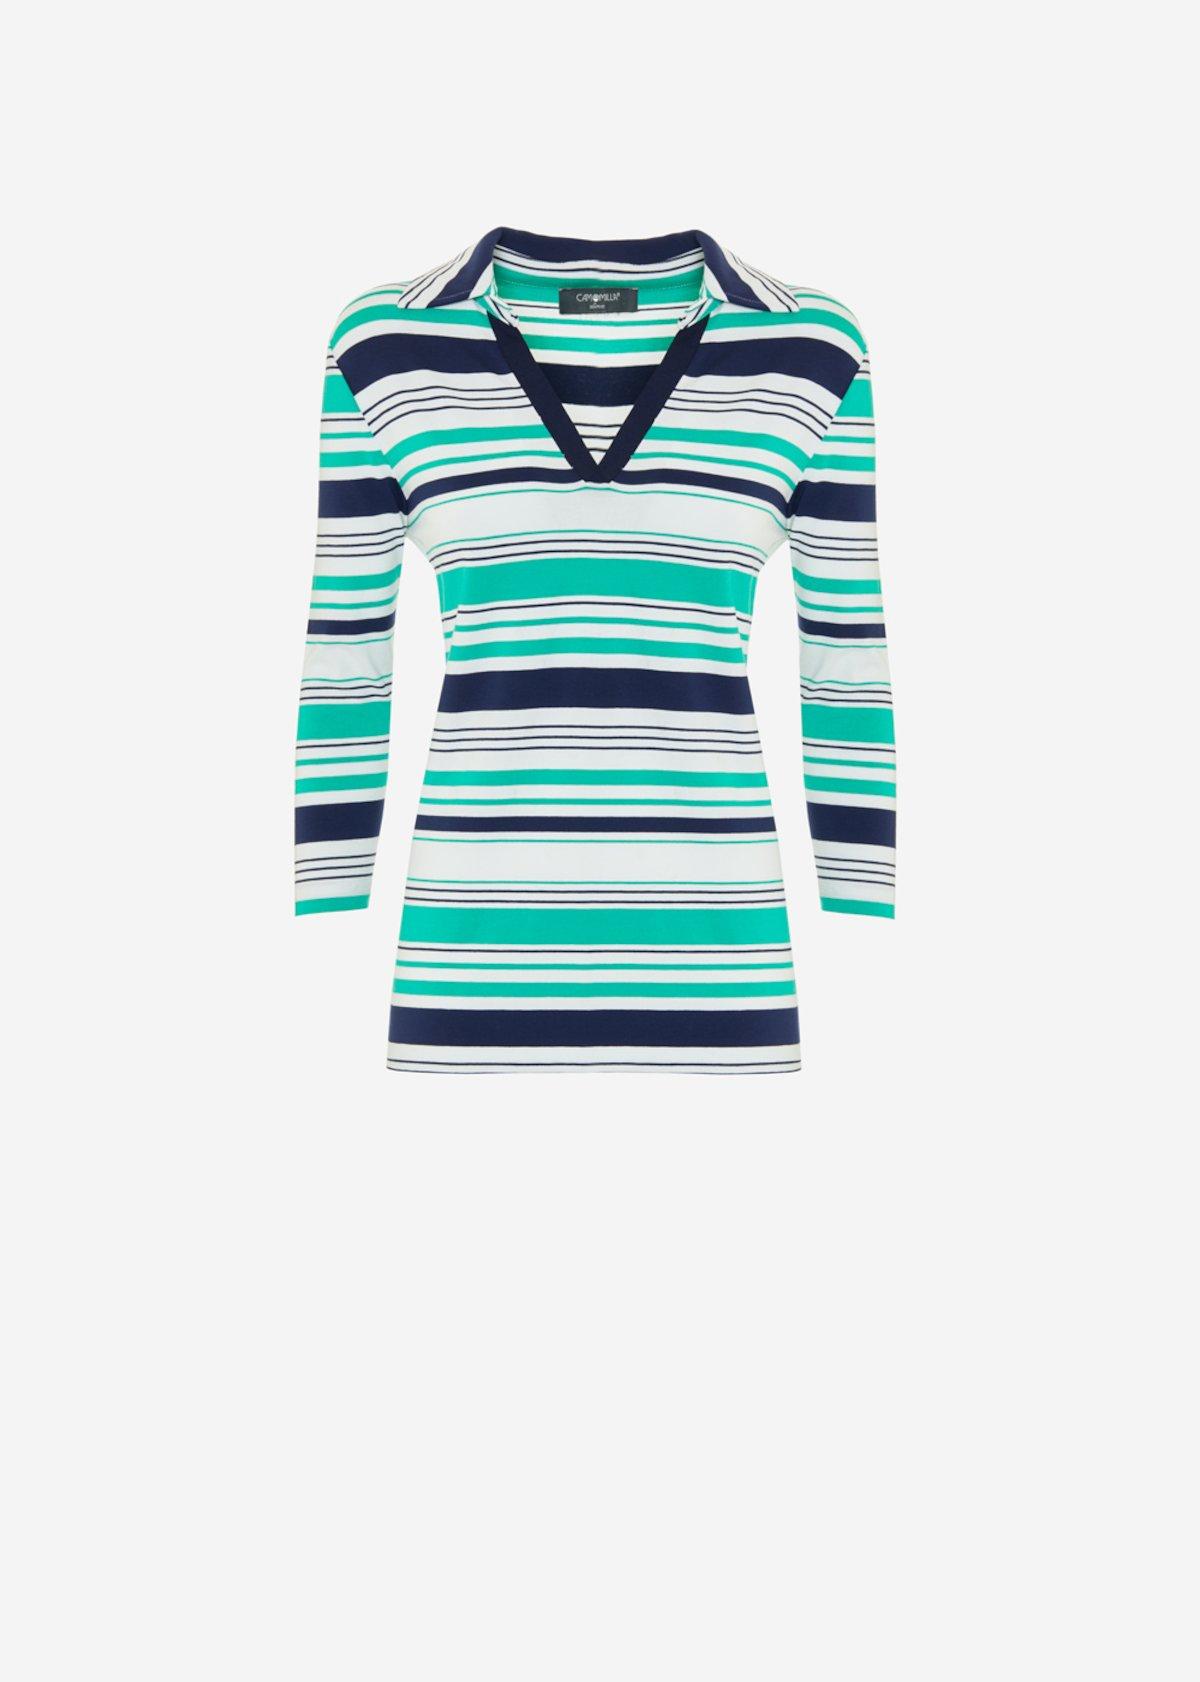 Selyn multicolour striped t-shirt - White\ Medium Blue Stripes